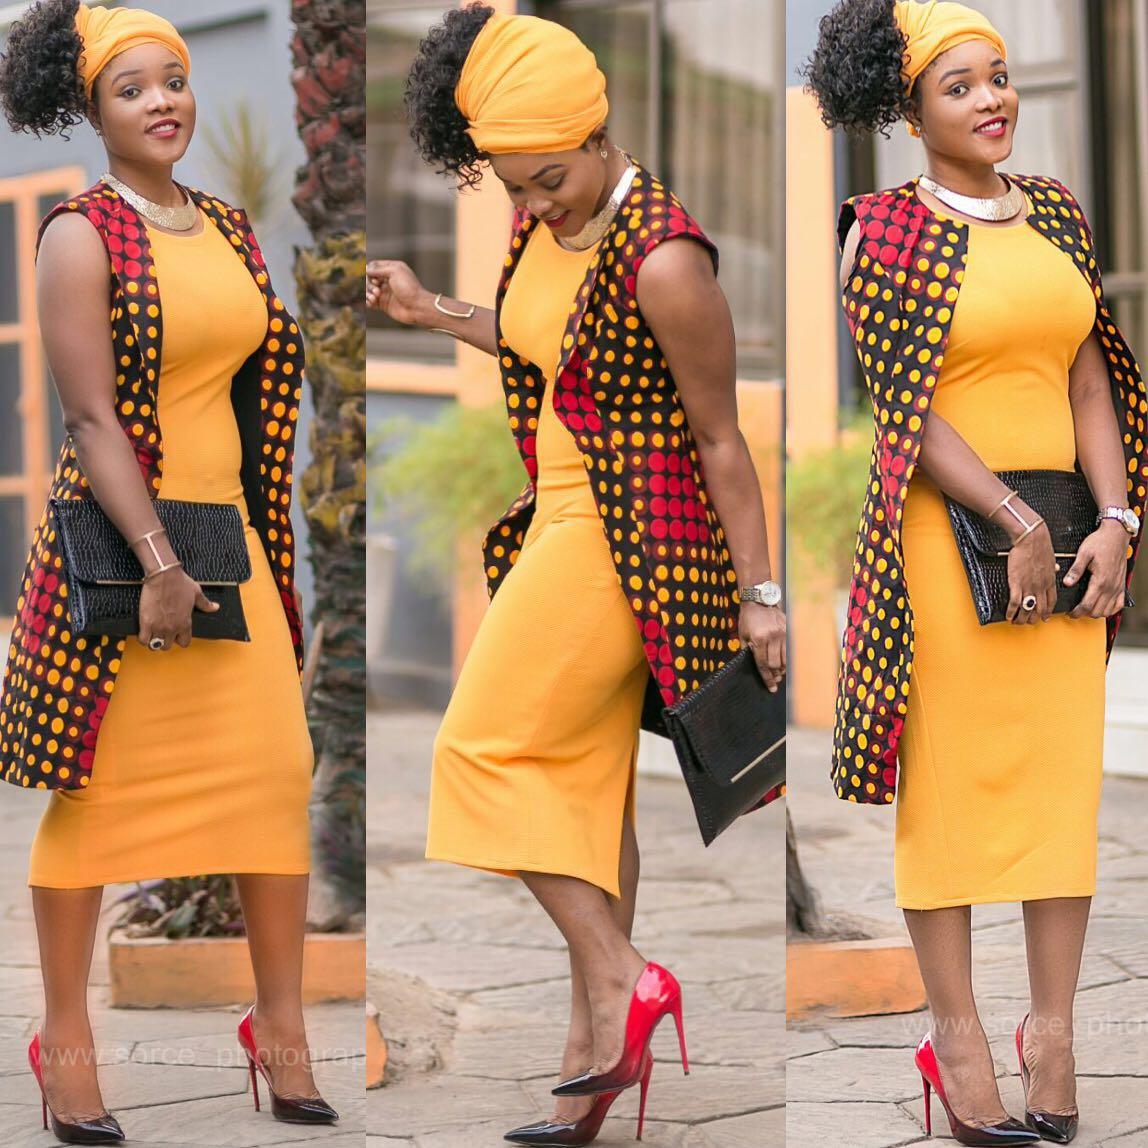 Nigerian fashion and style magazine 49